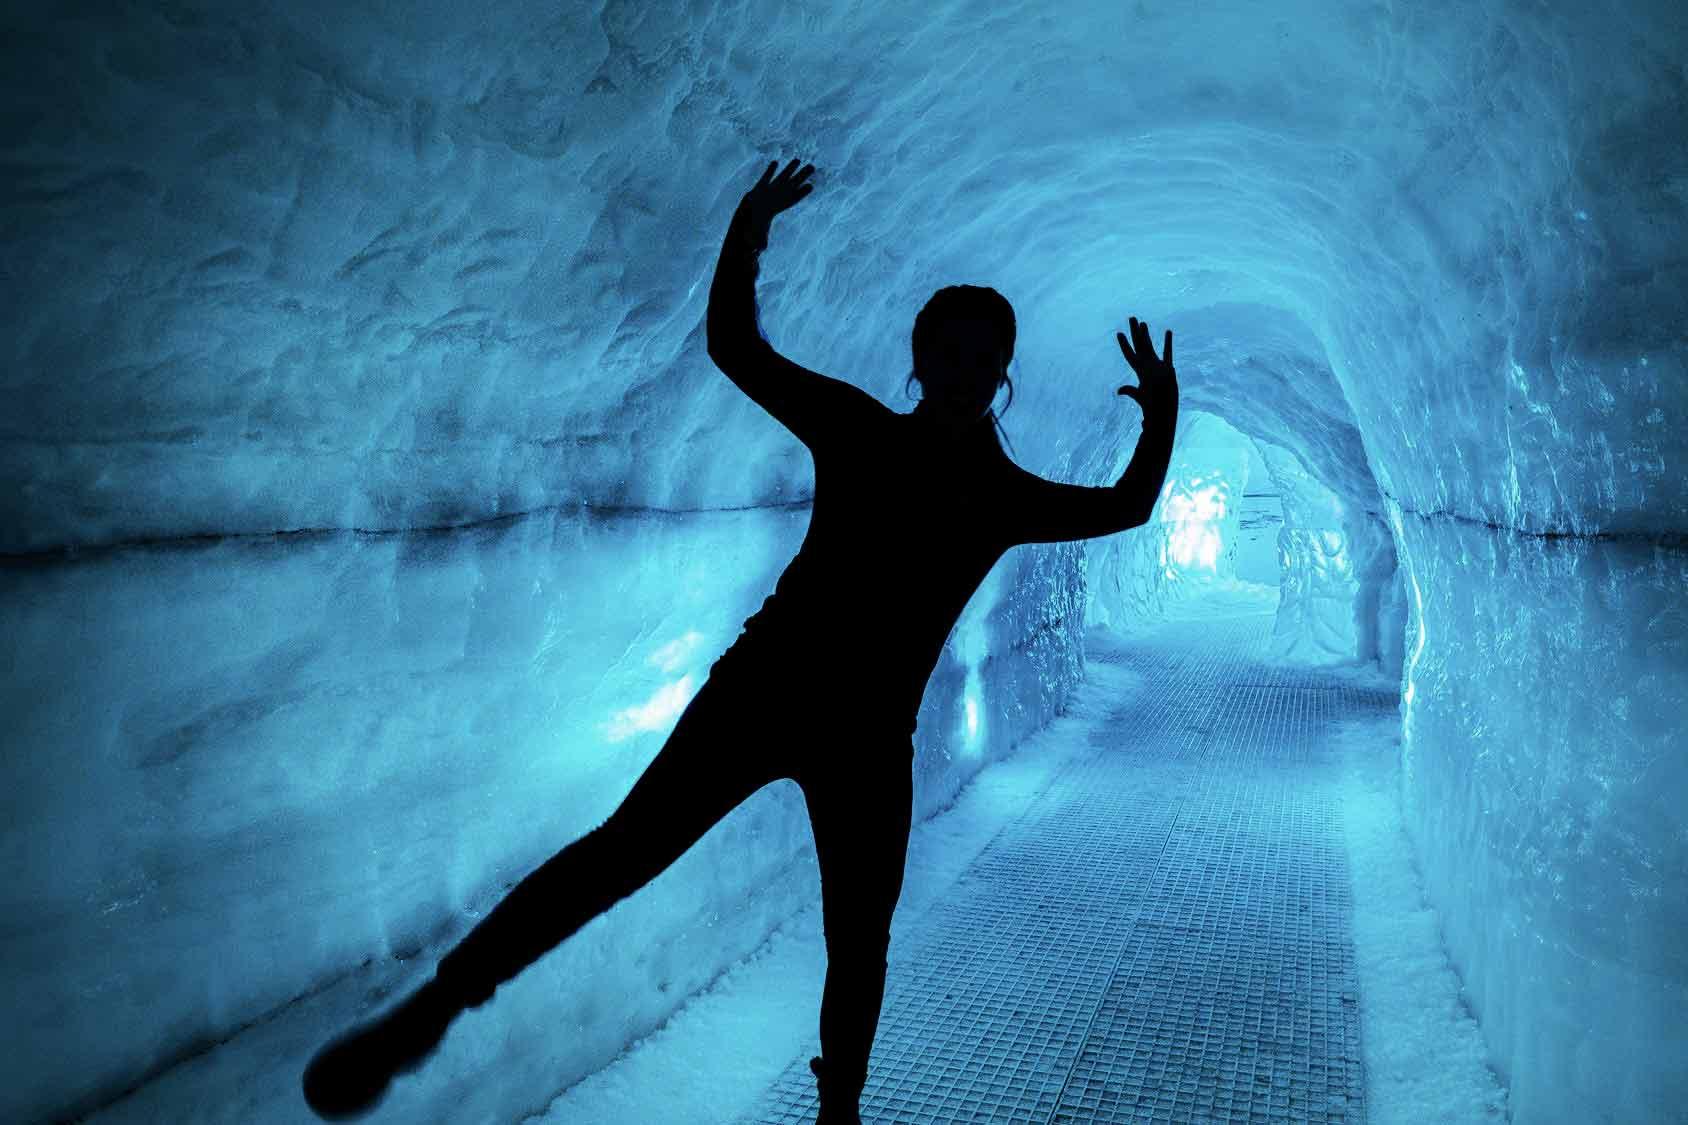 Perlan Ice Cave Exhibition